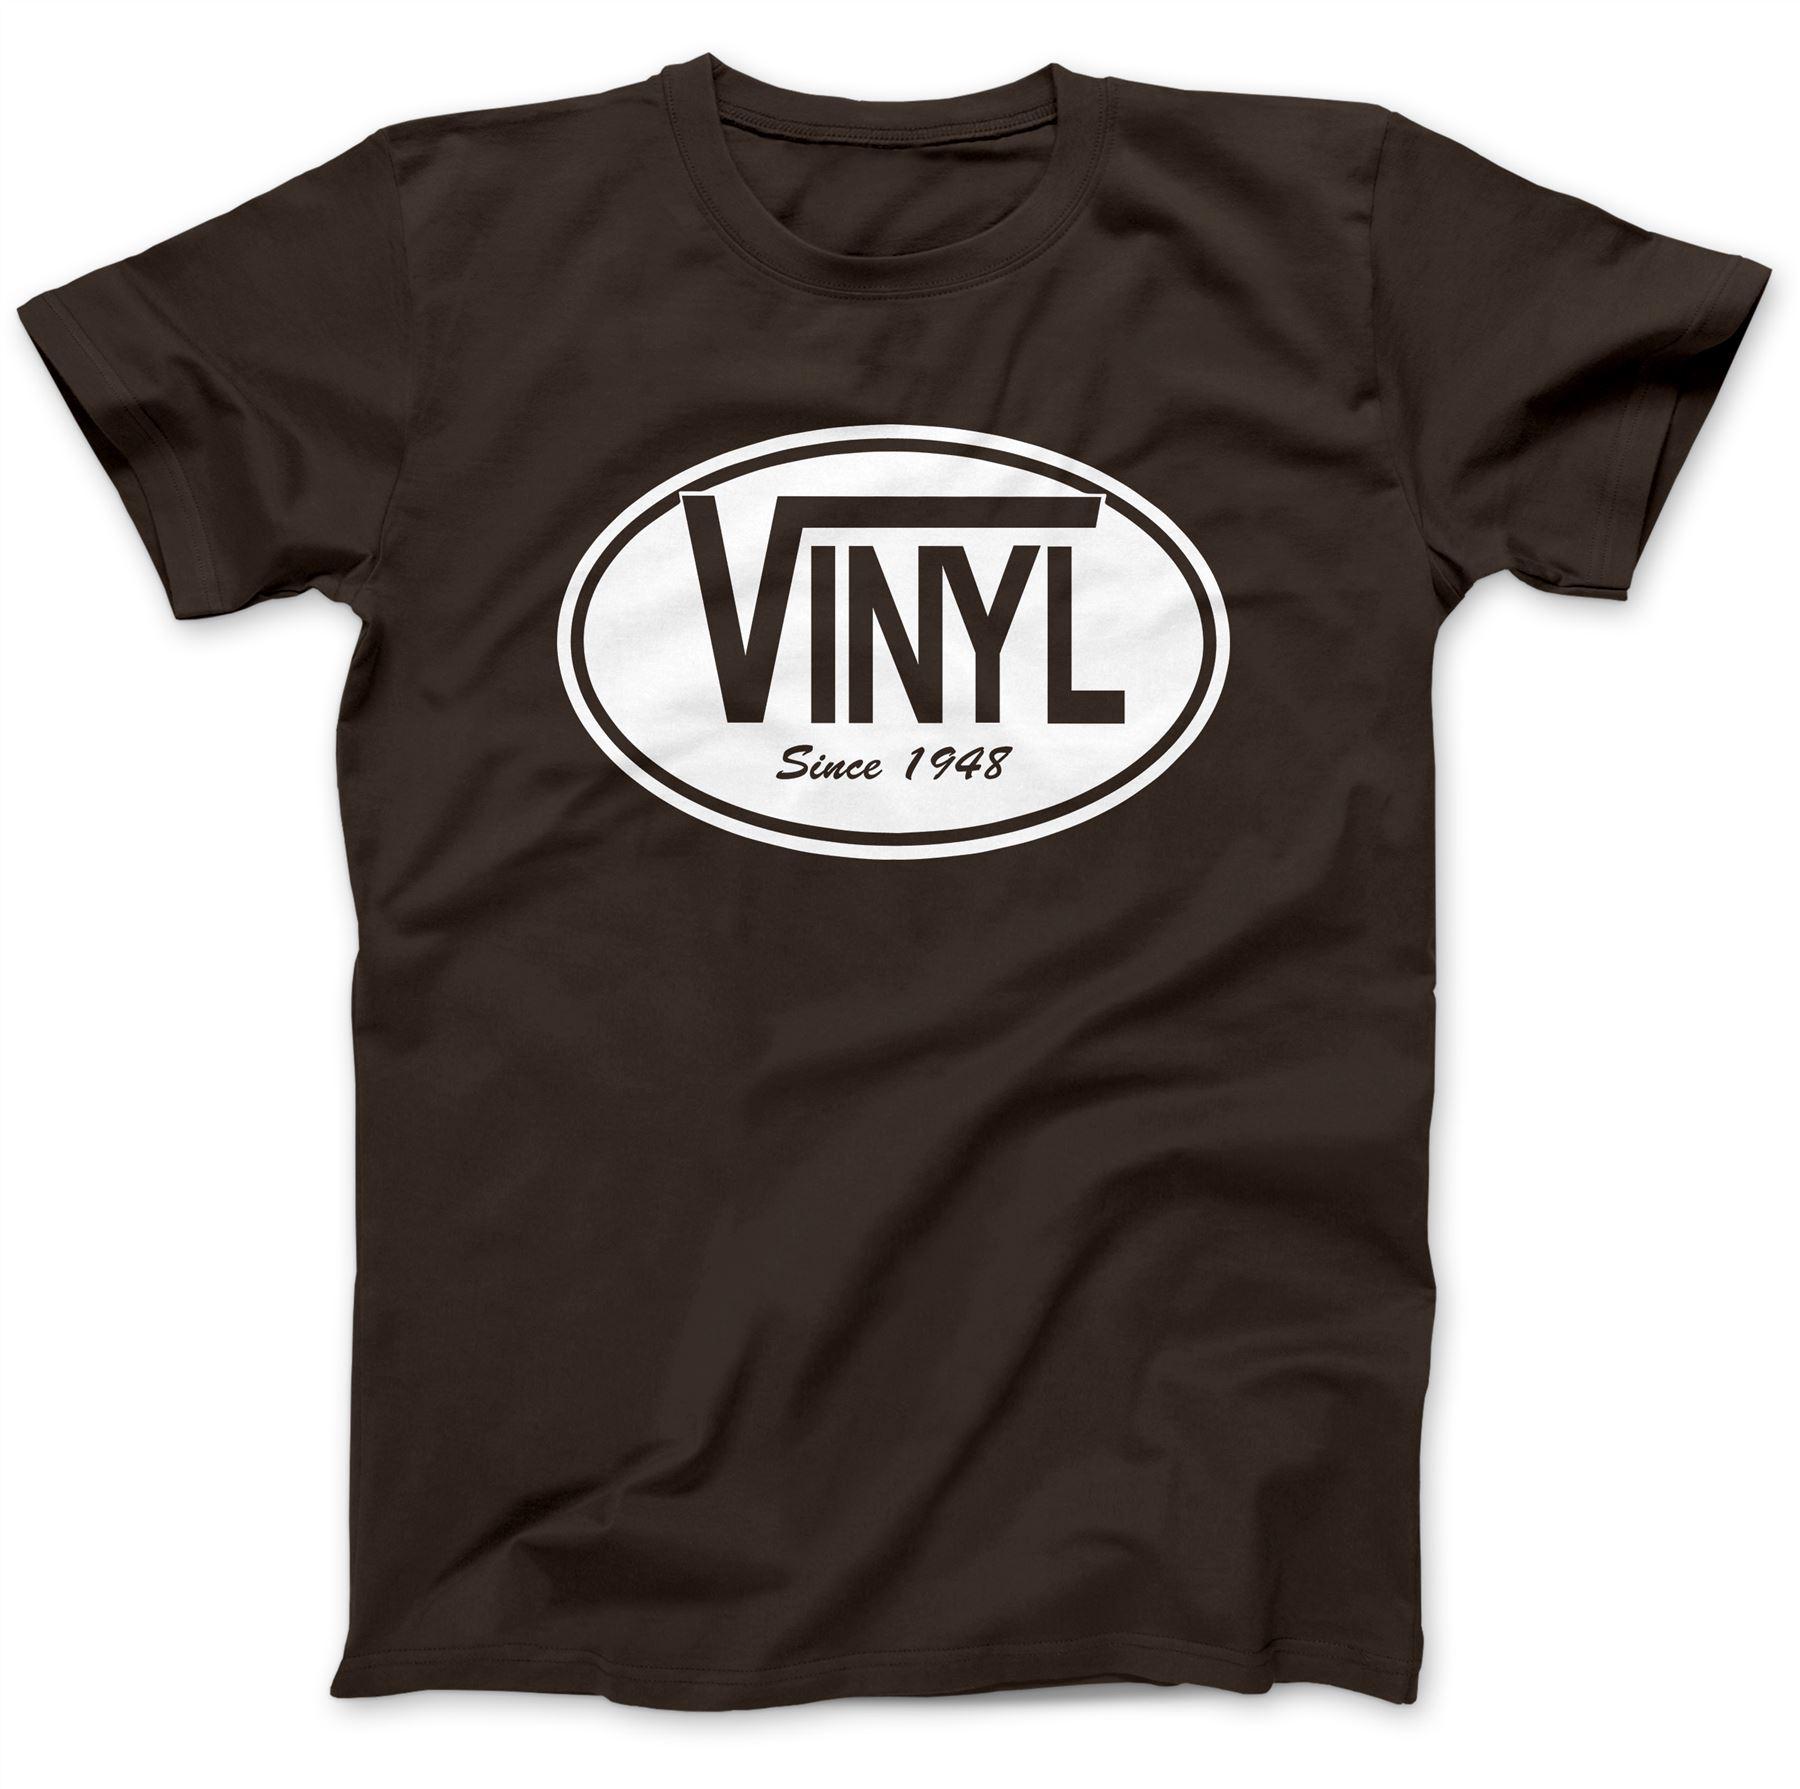 Vinyl Since 1948 Record DJ T-Shirt 100/% Premium Cotton Gift Present